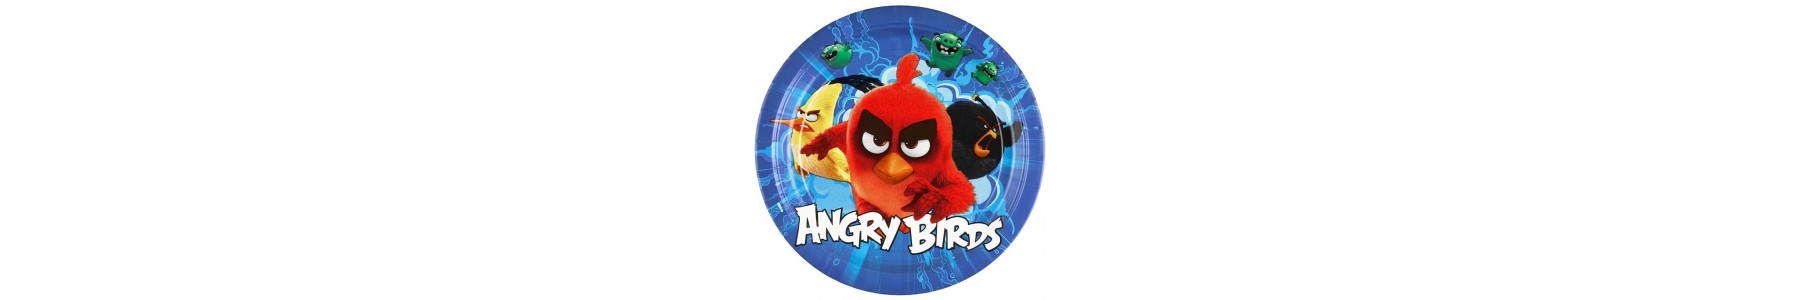 Articole de petrecere Angry Birds 3